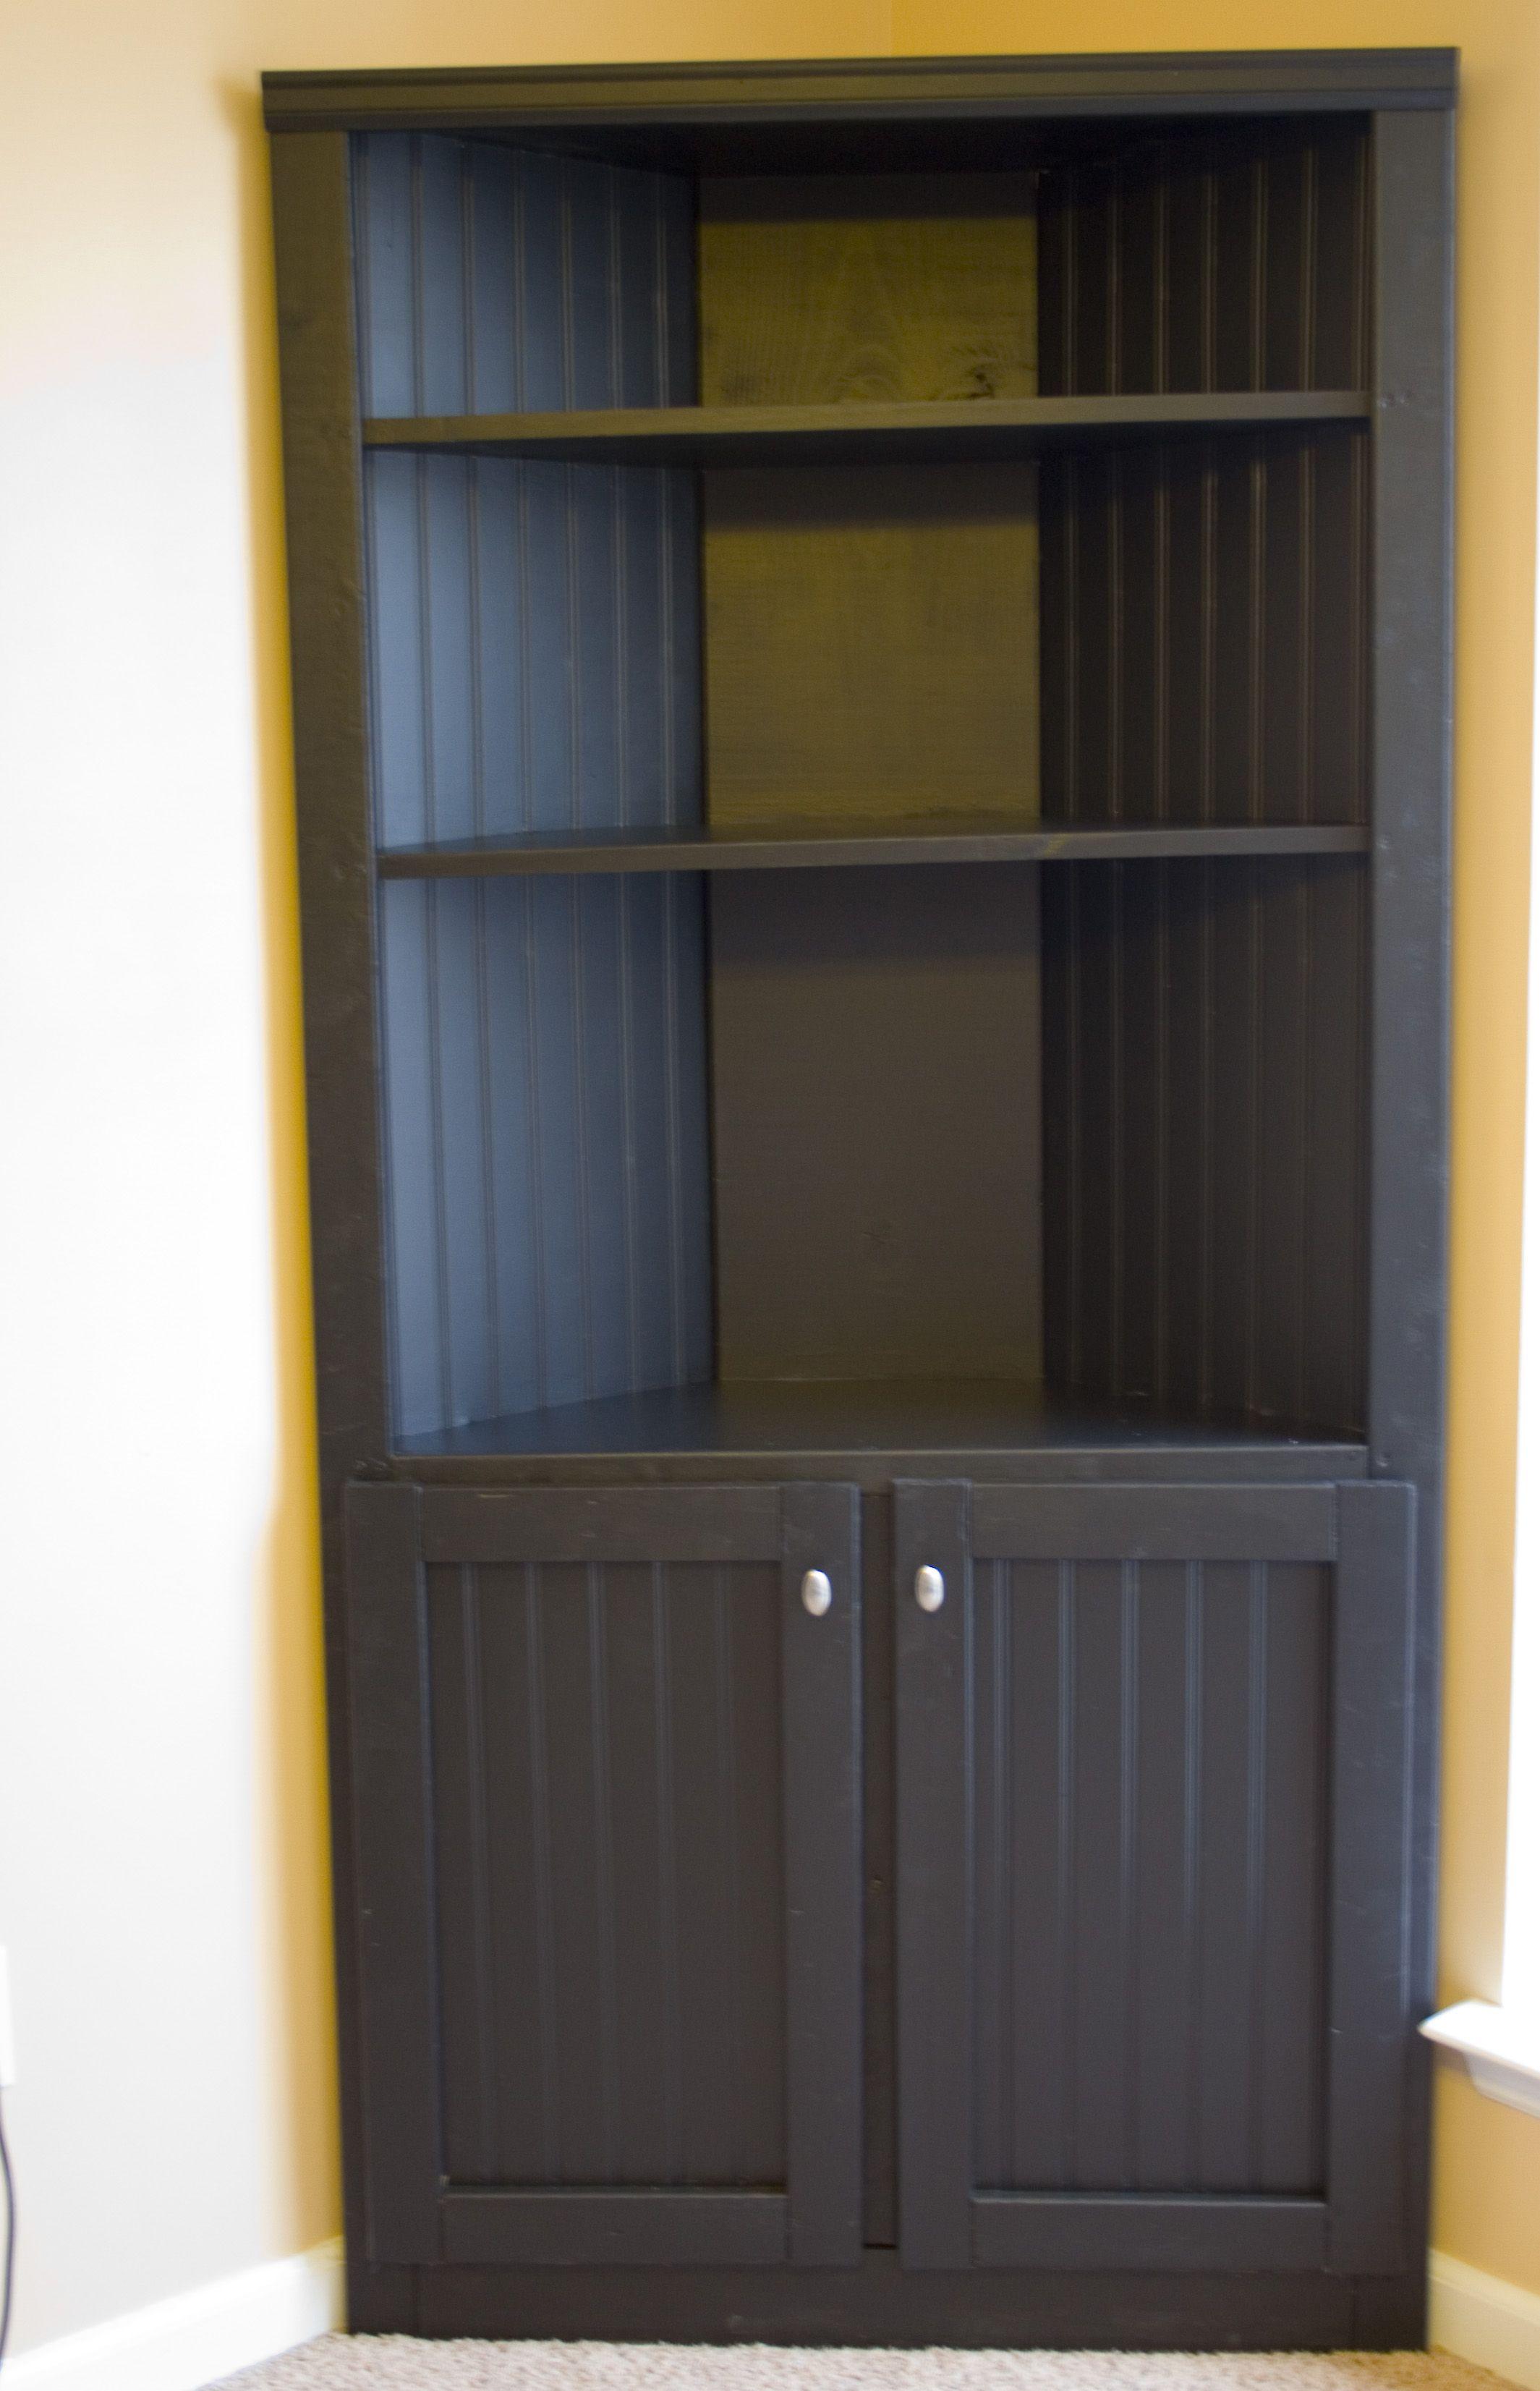 storage cabinets for kitchen roll cling film tin foil dispenser cute built in corner cabinet